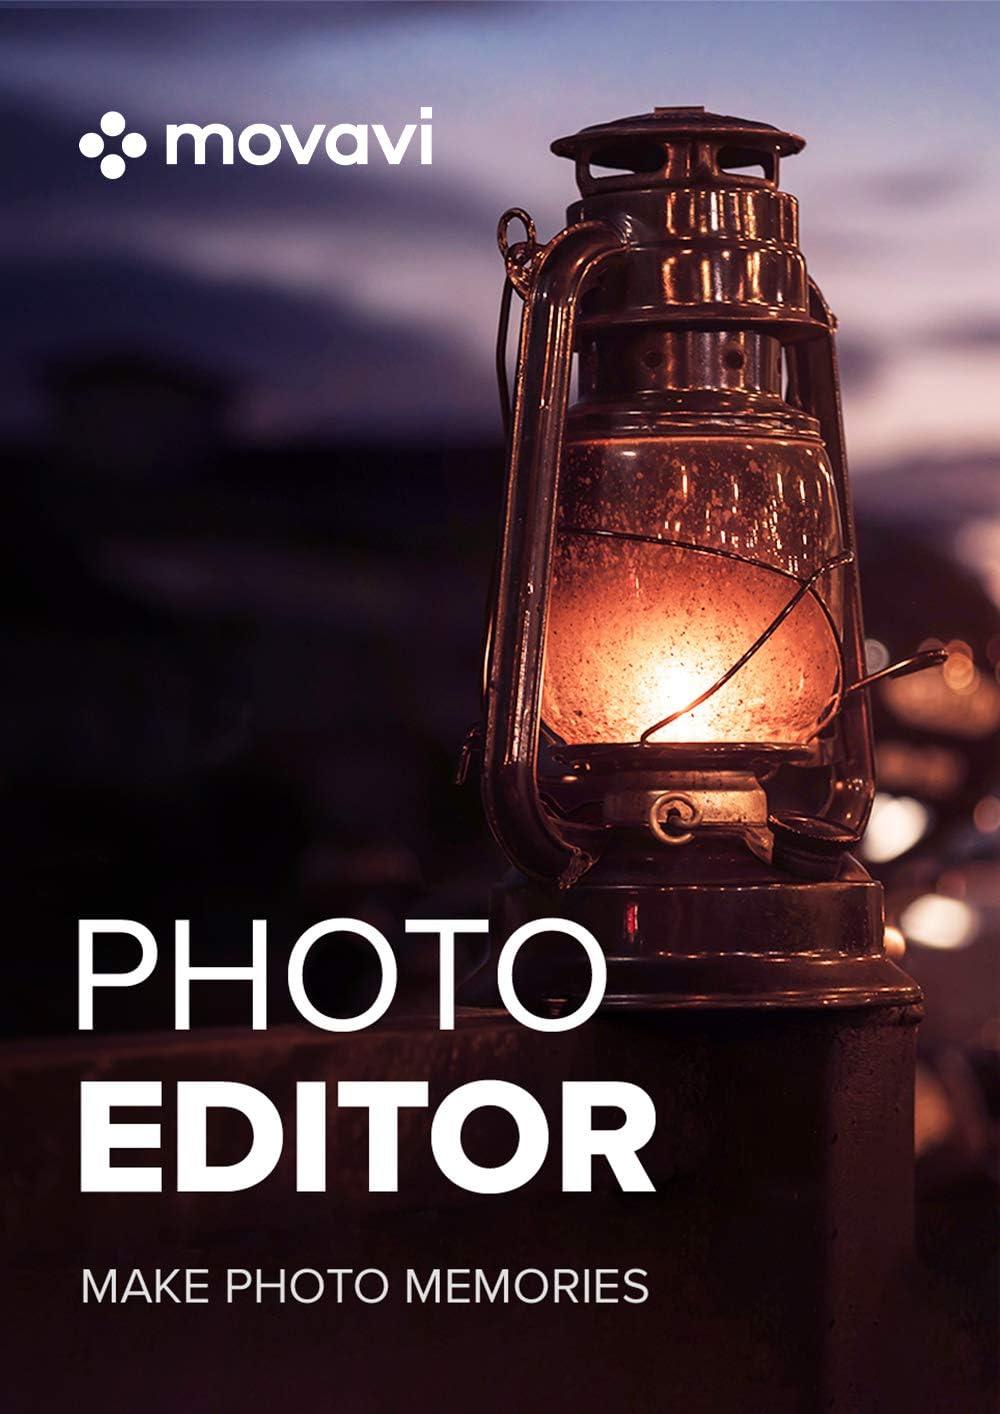 Movavi Photo Editor 6 Personal [PC Download] 61SIlPfK2BTL